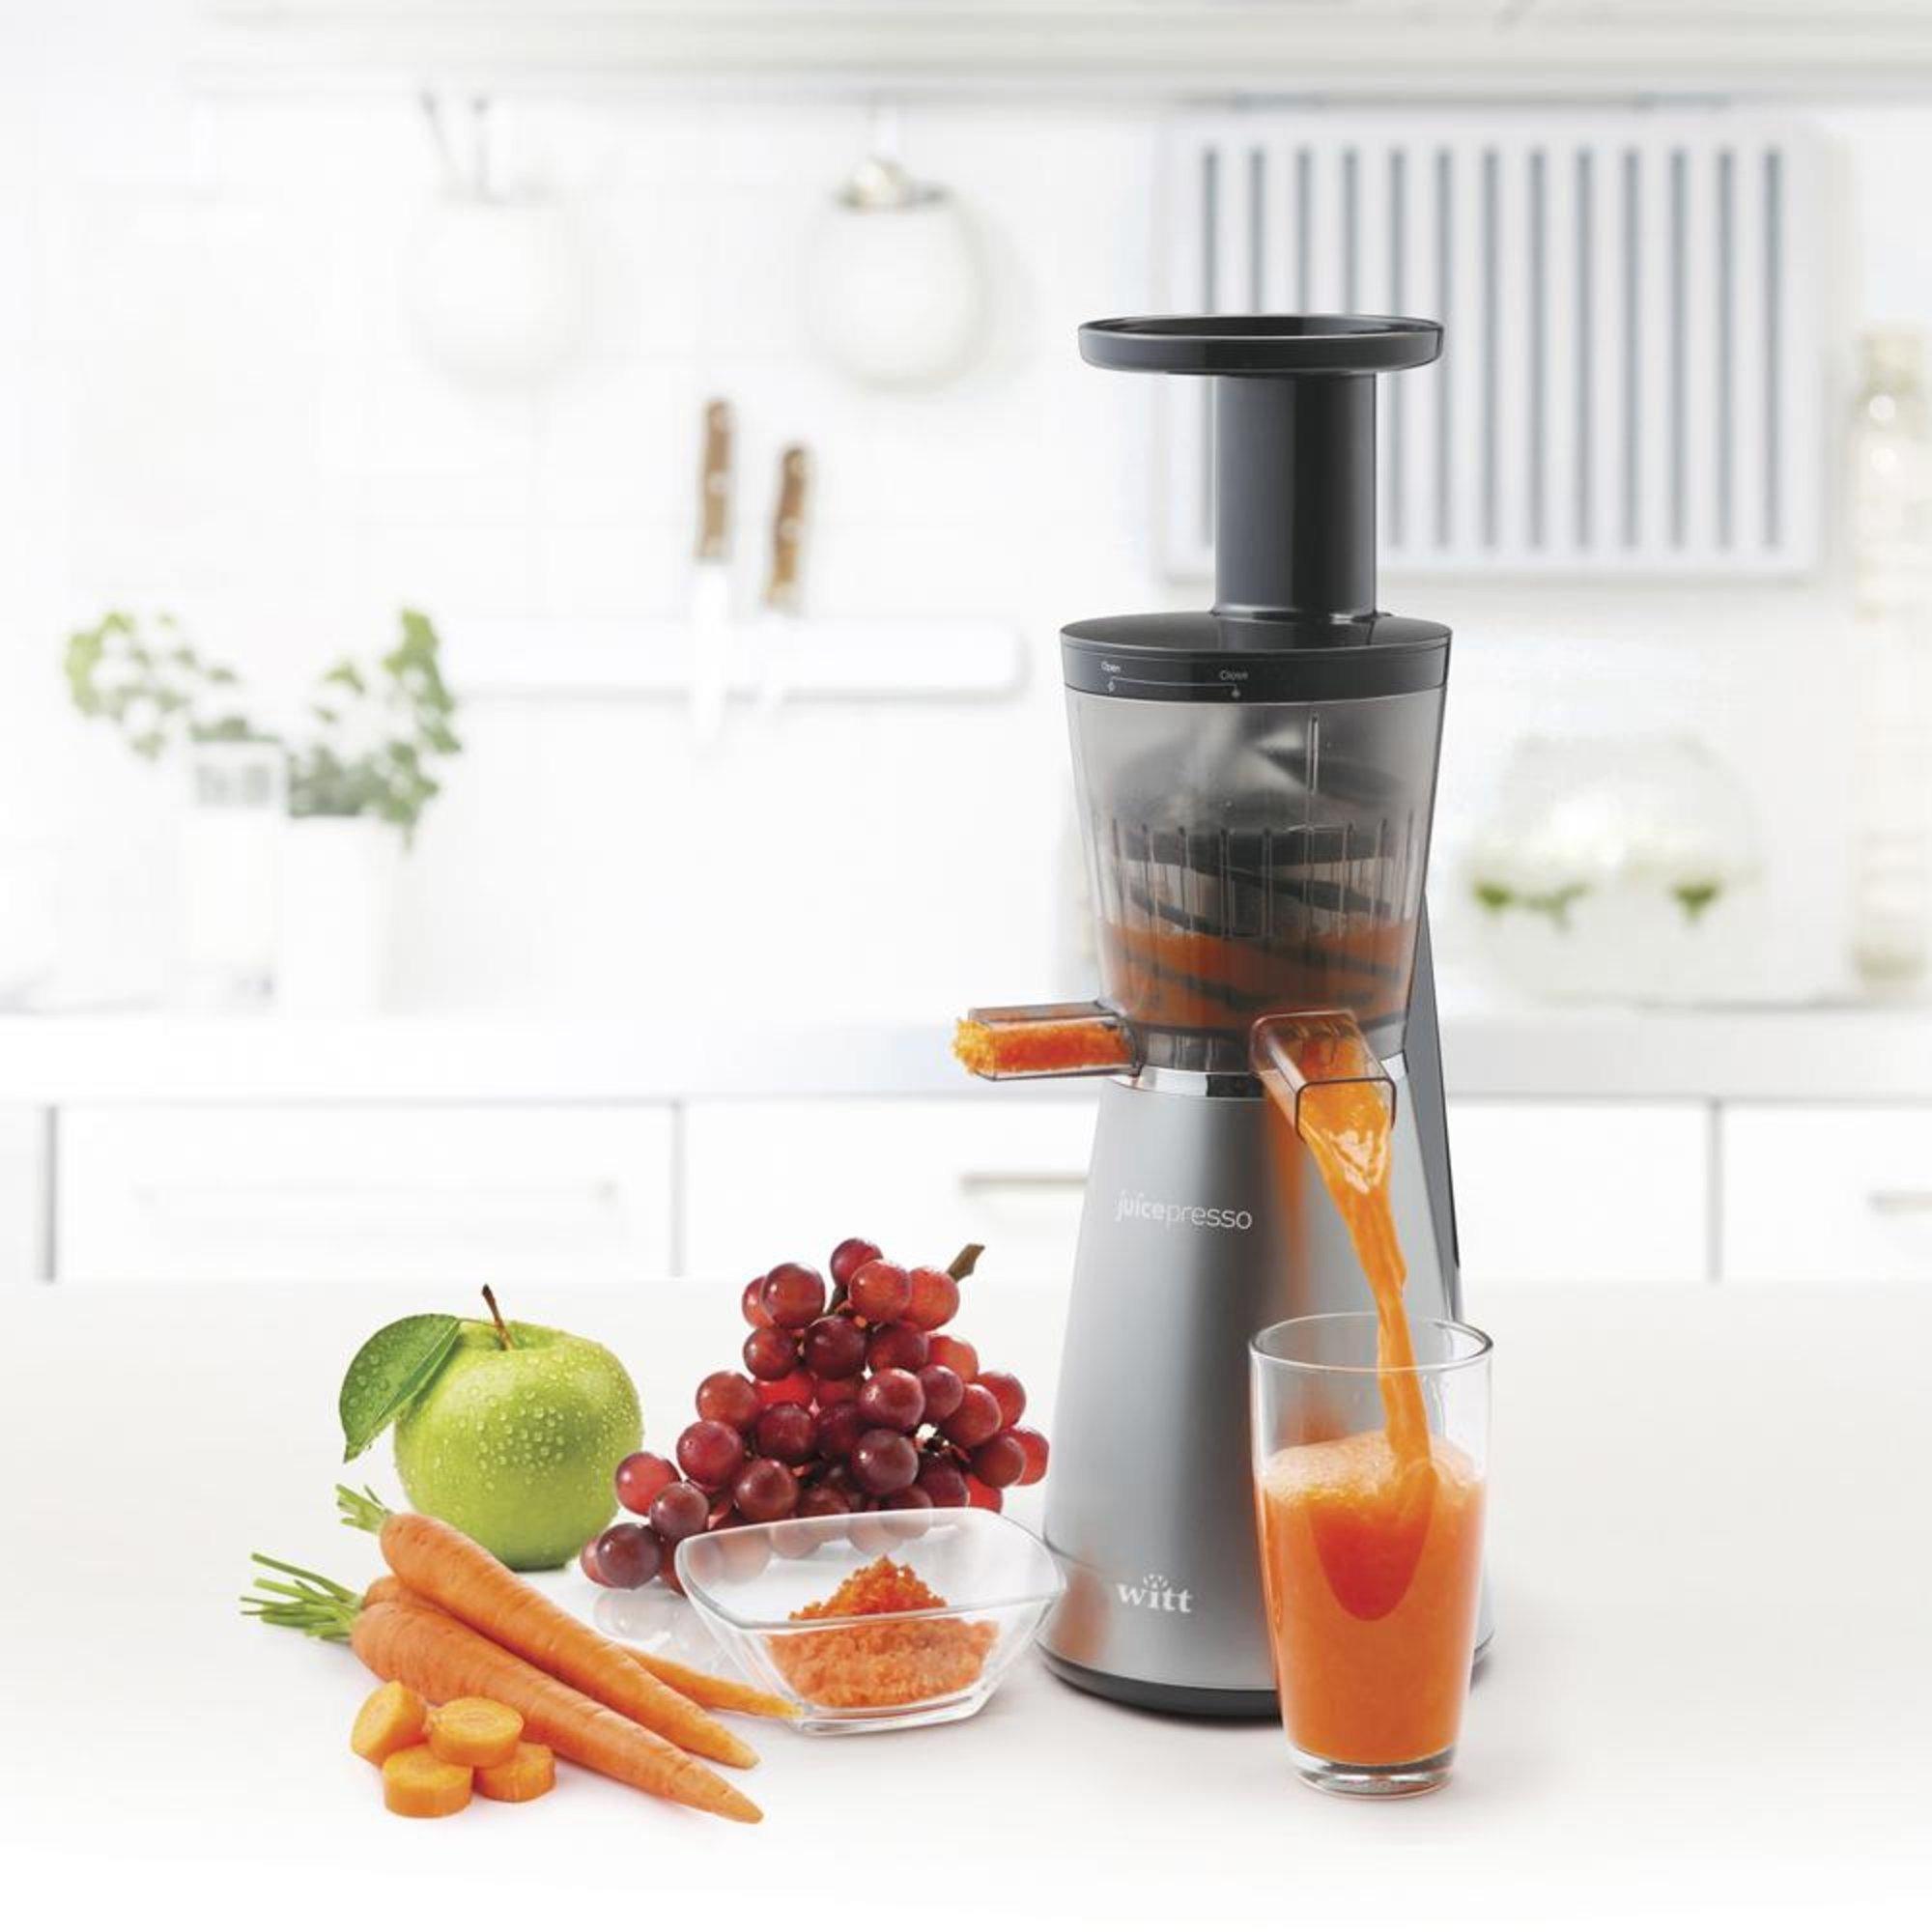 Witt Slow Juicer Rengoring : Juicepresso WJPS-1 Slow Juicer fra Witt Gratis Levering